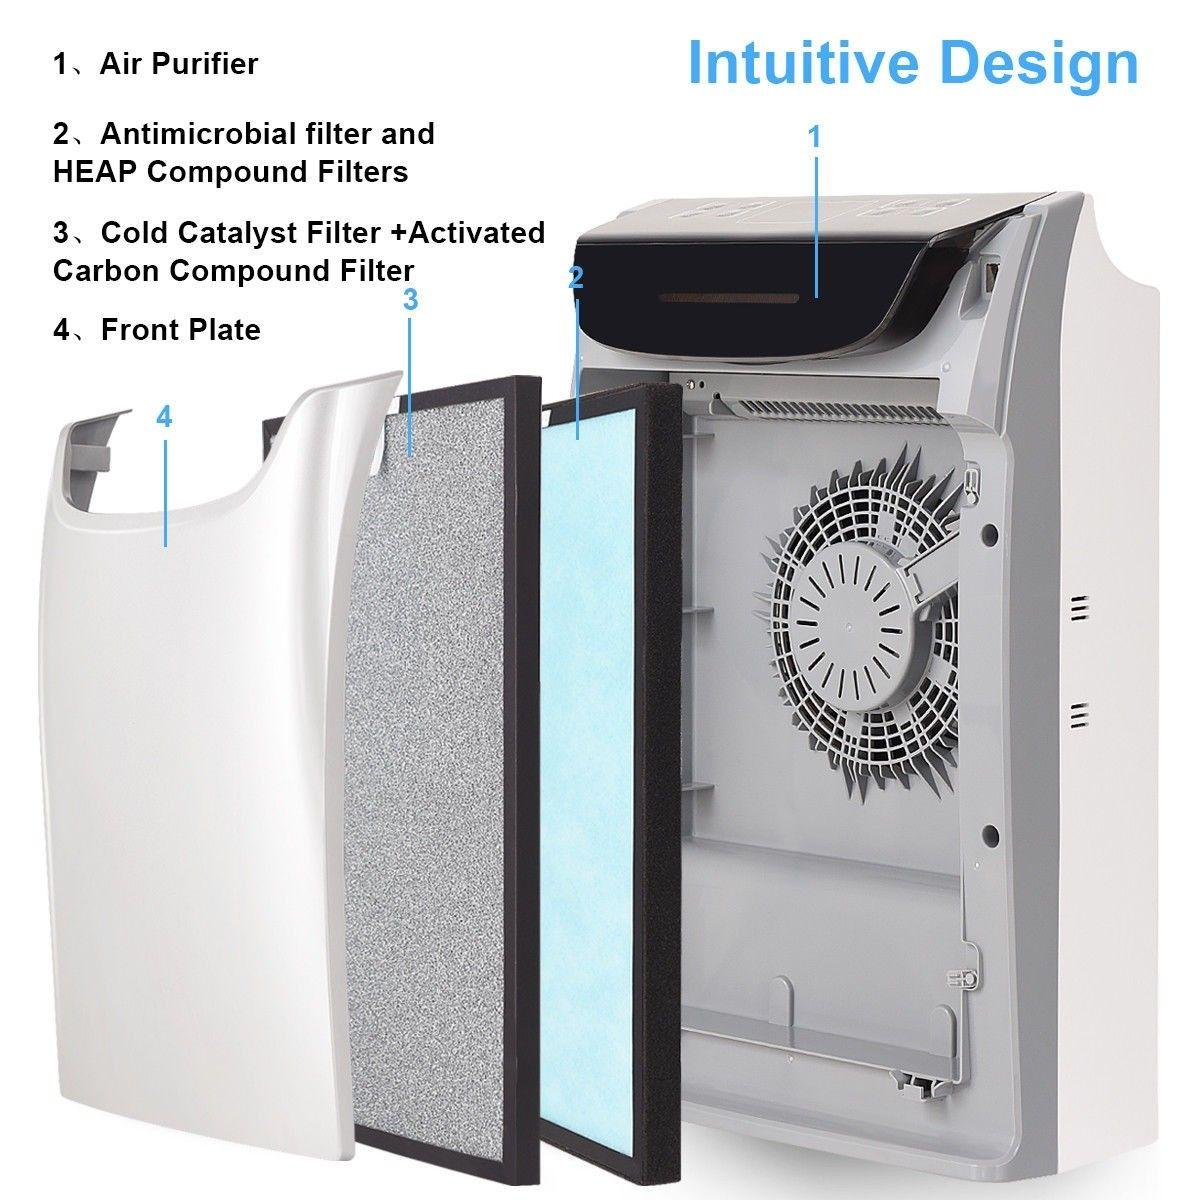 HEPA Air Purifier Powerful Air Cleaner Hepa air purifier